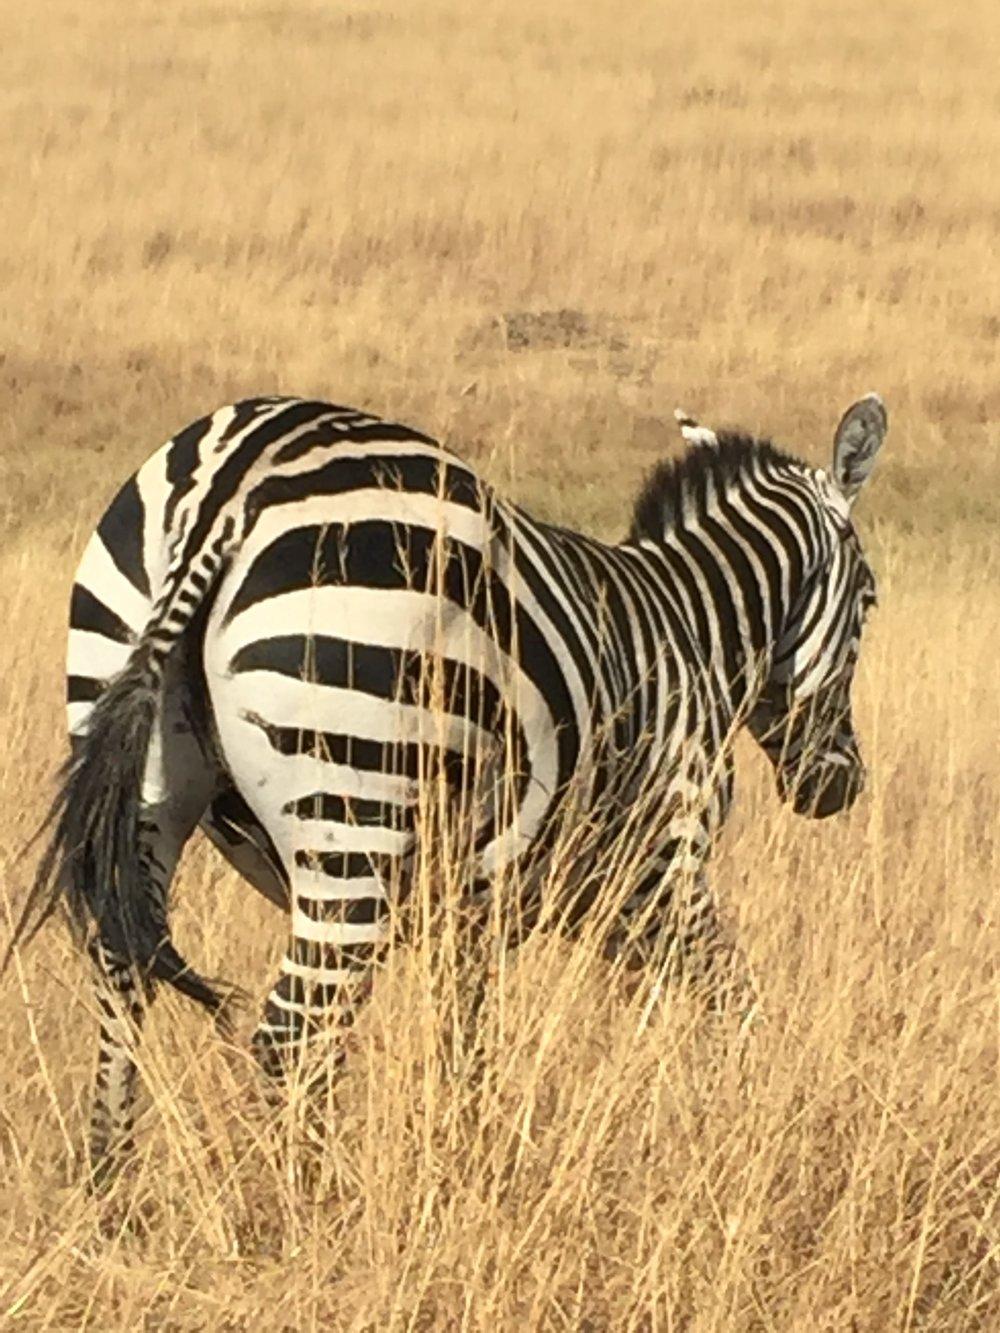 Safari - Nairobi, Kenya